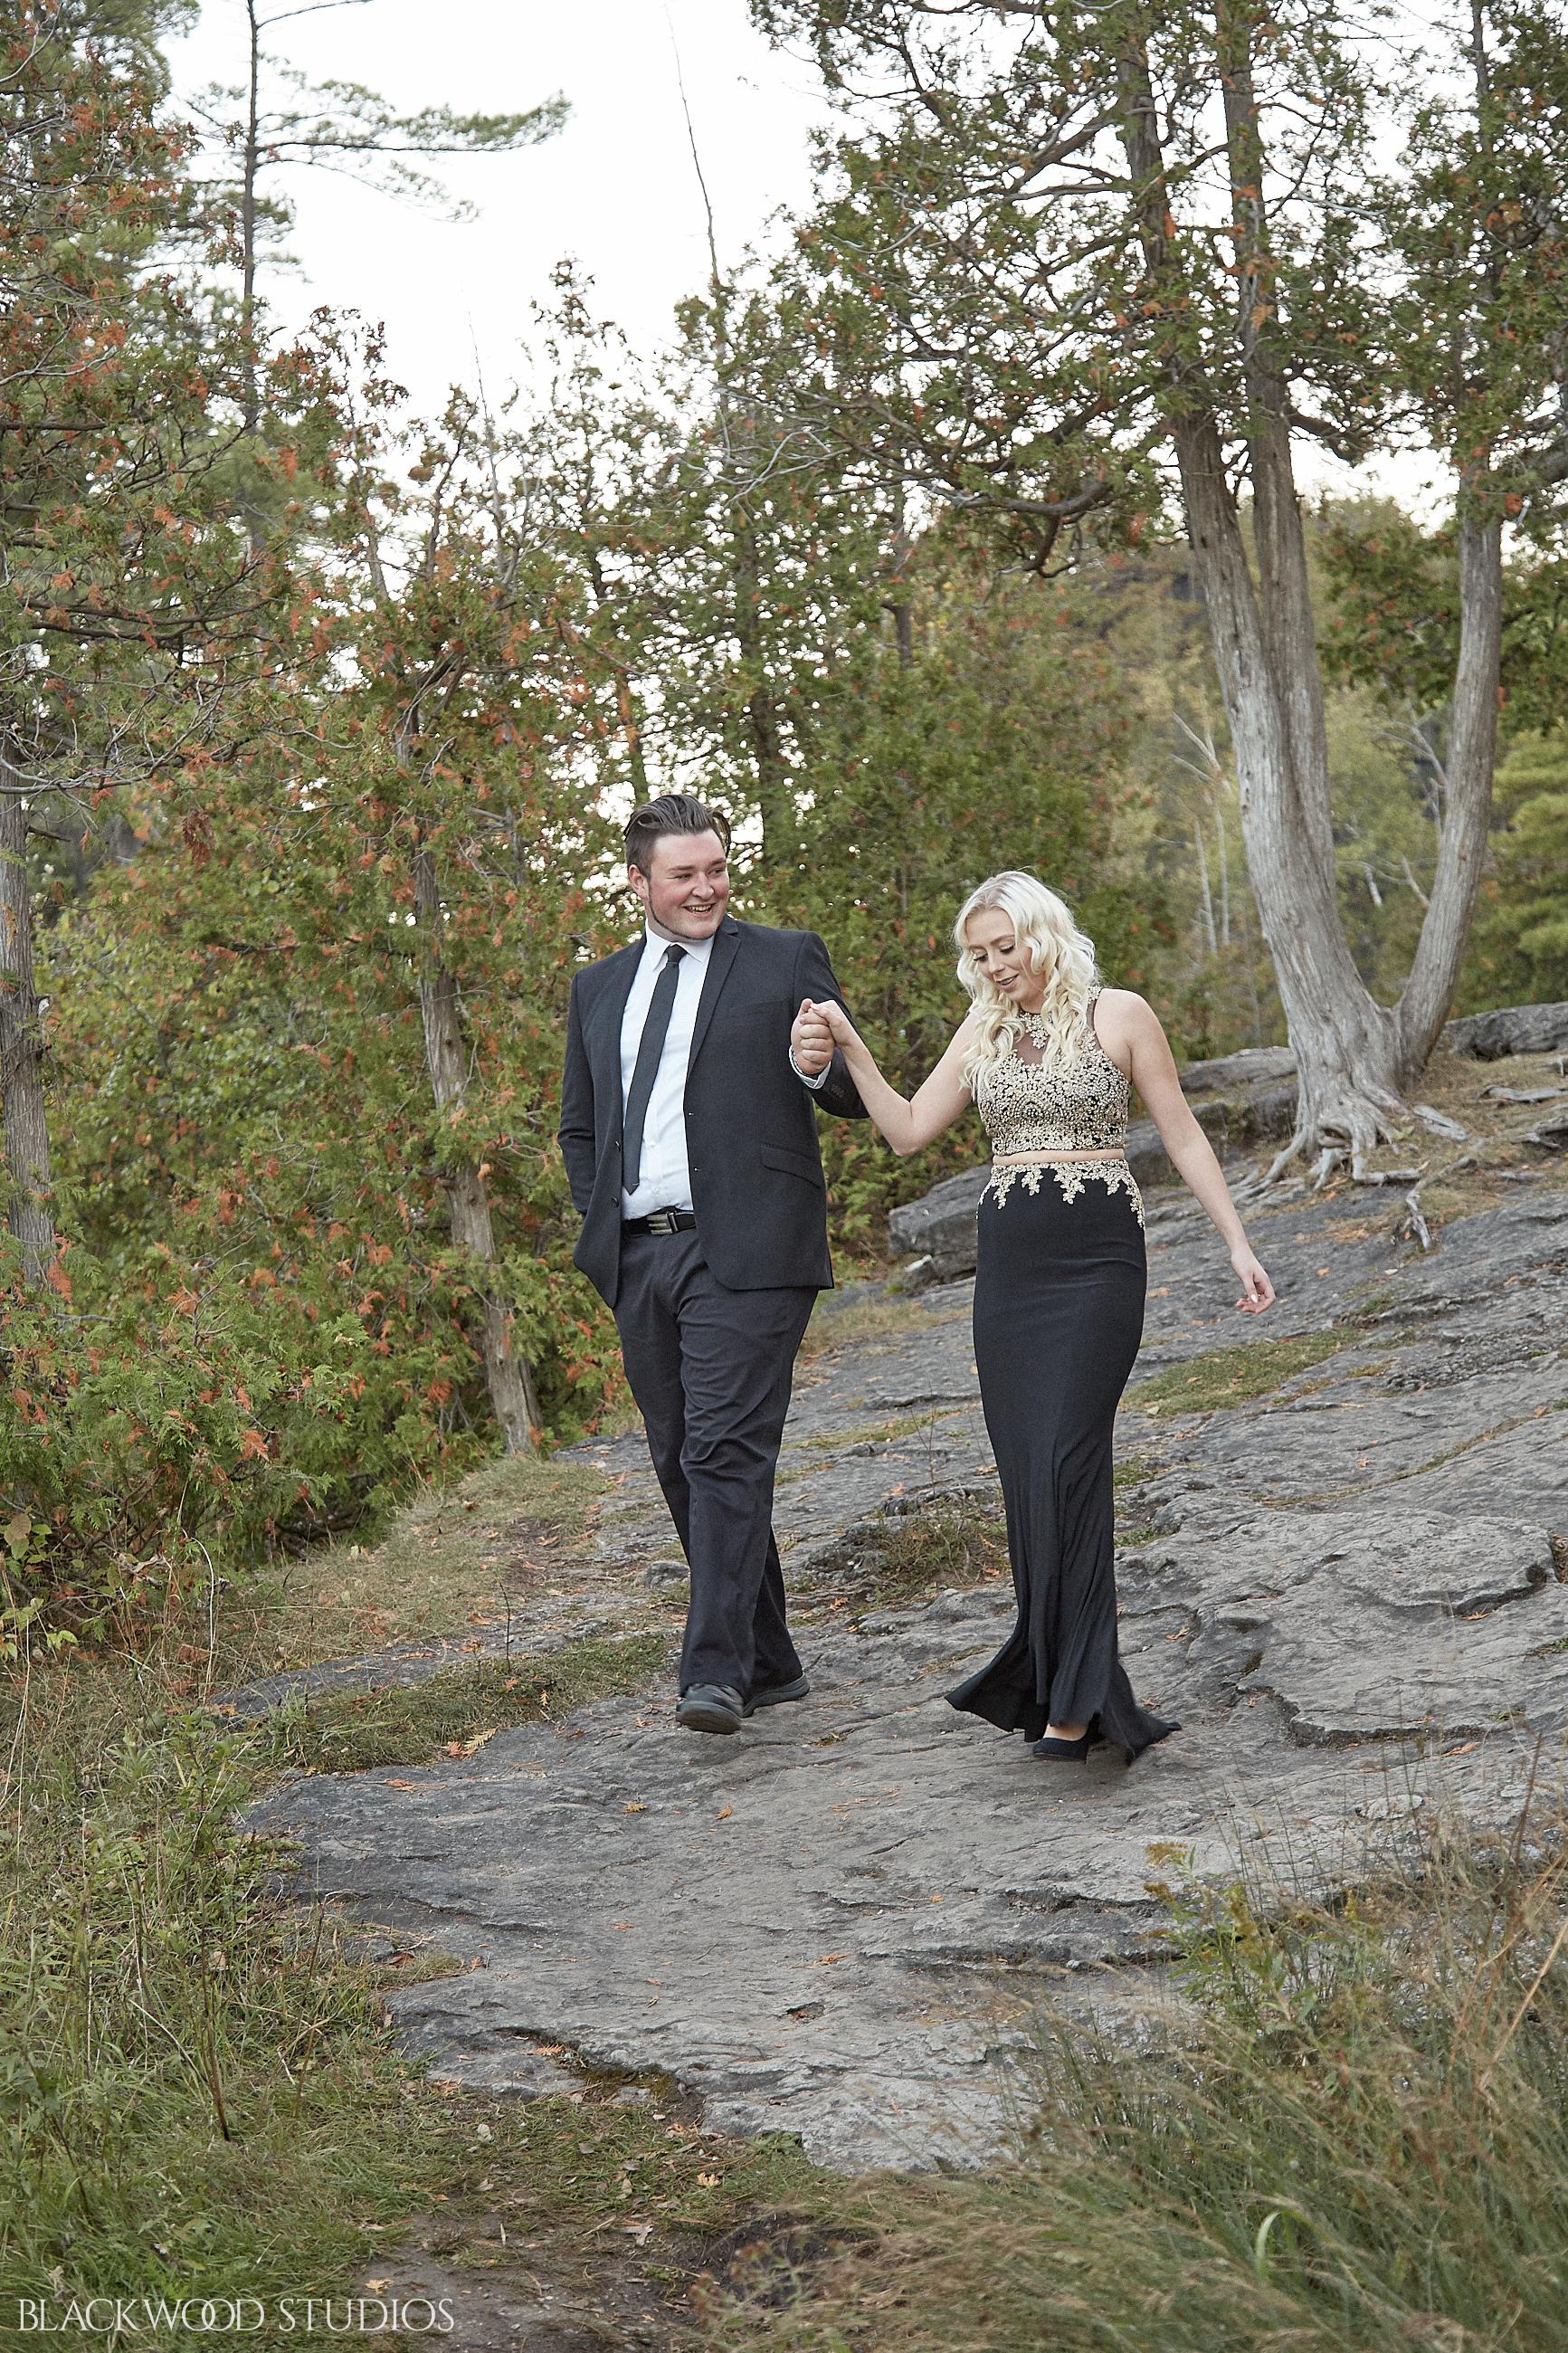 20171001 18-51-14 Nickee and Adam Engagement 0564.jpg